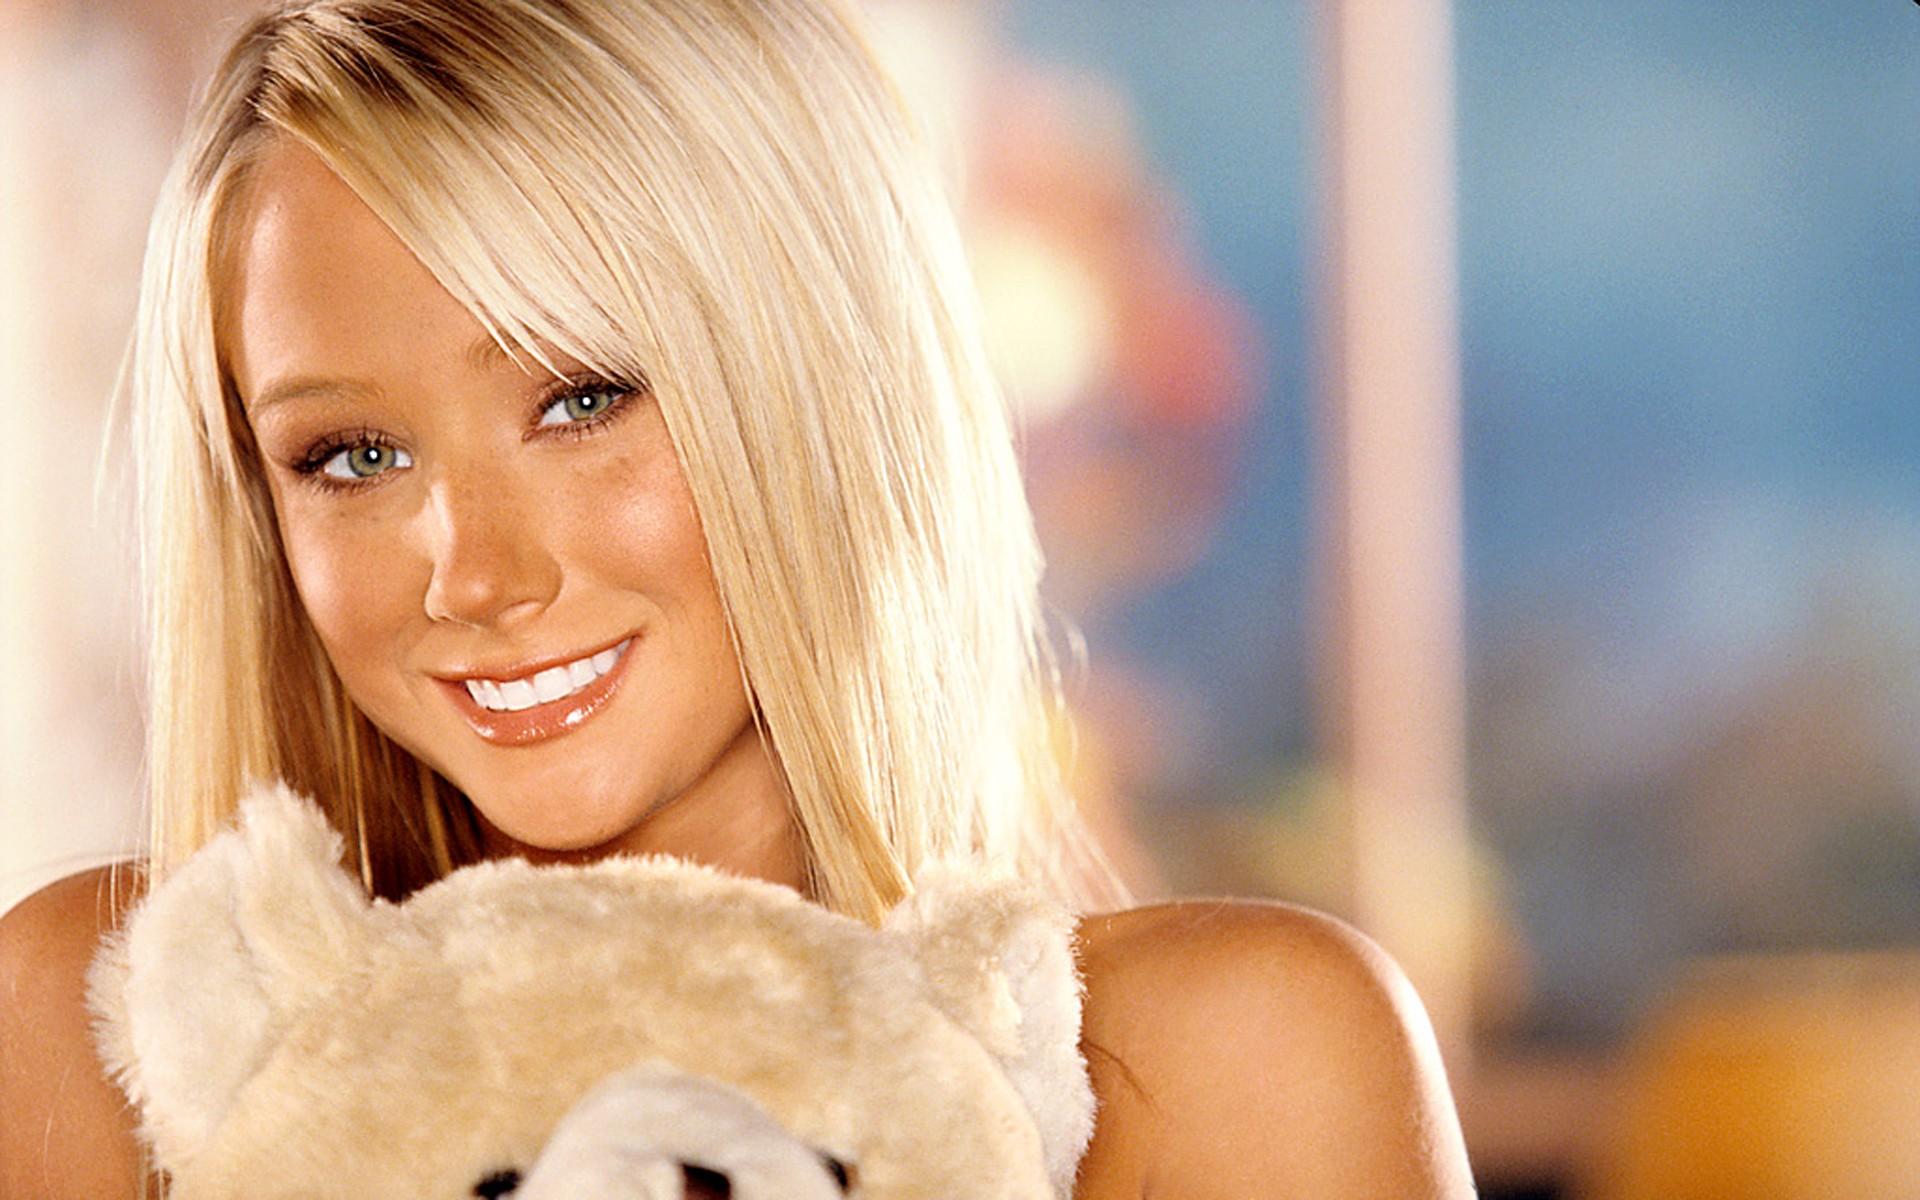 Wallpaper Face Women Model Blonde Long Hair Nose Skin